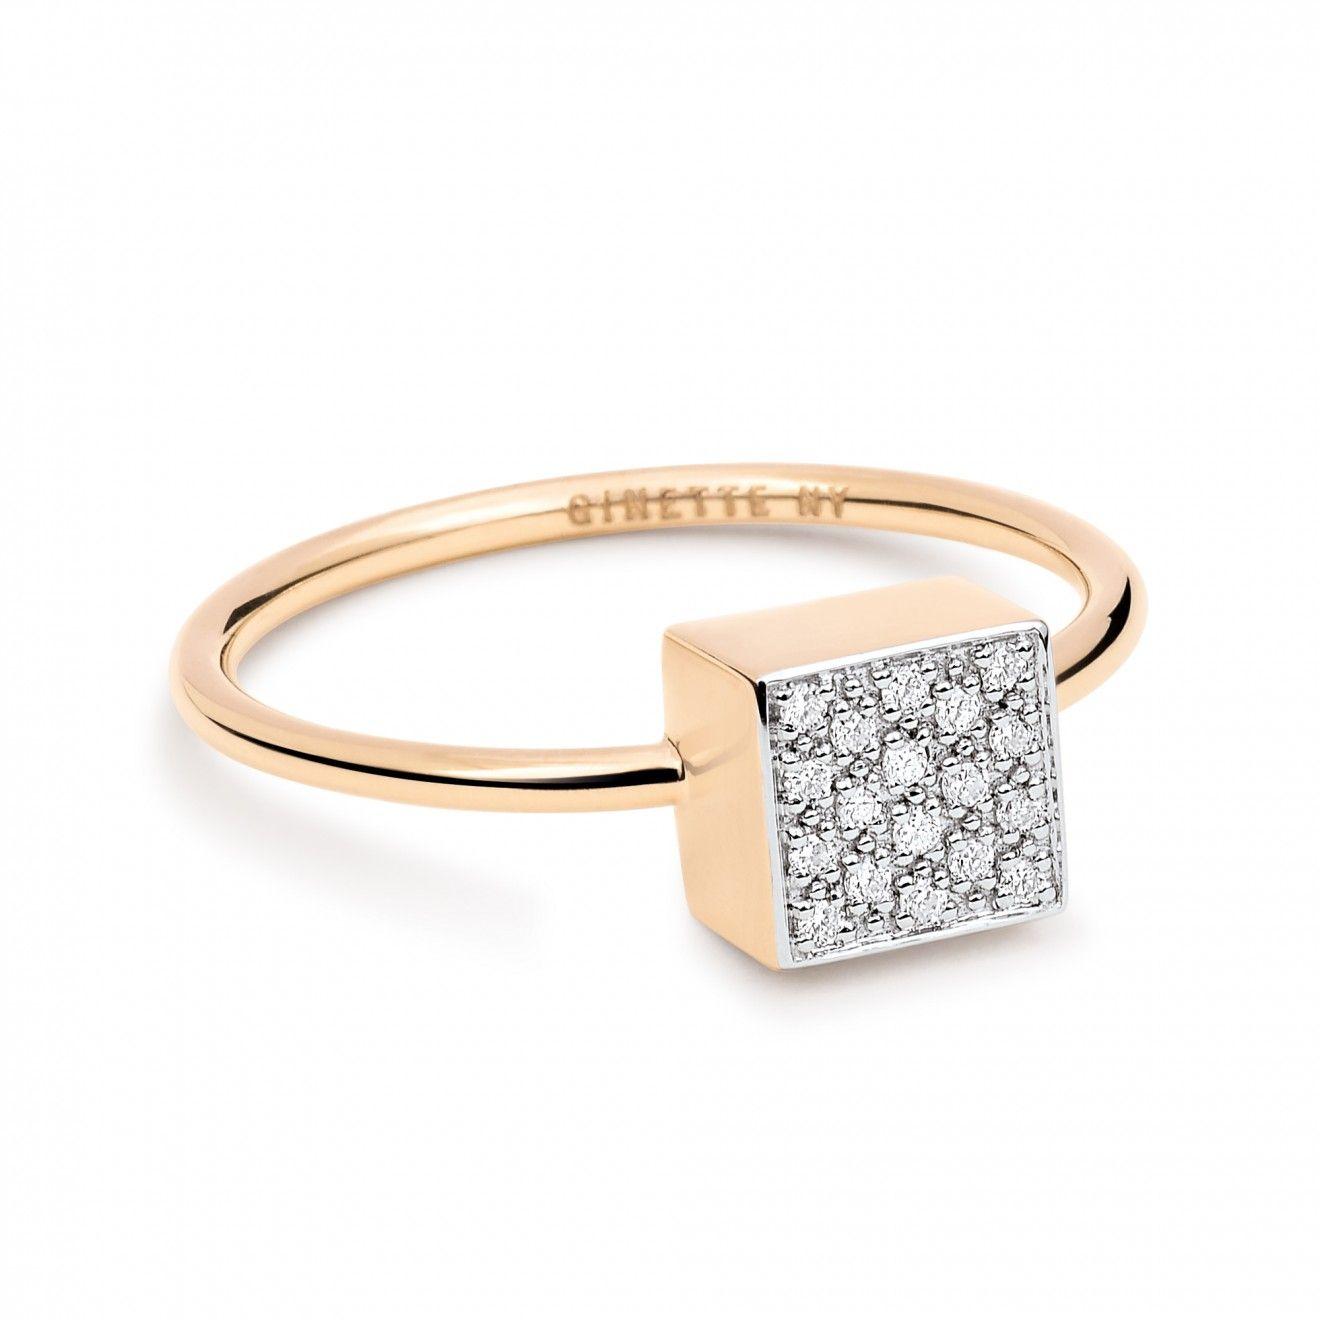 Ginette NY Large Wise 18-karat rose gold ring HIcnp